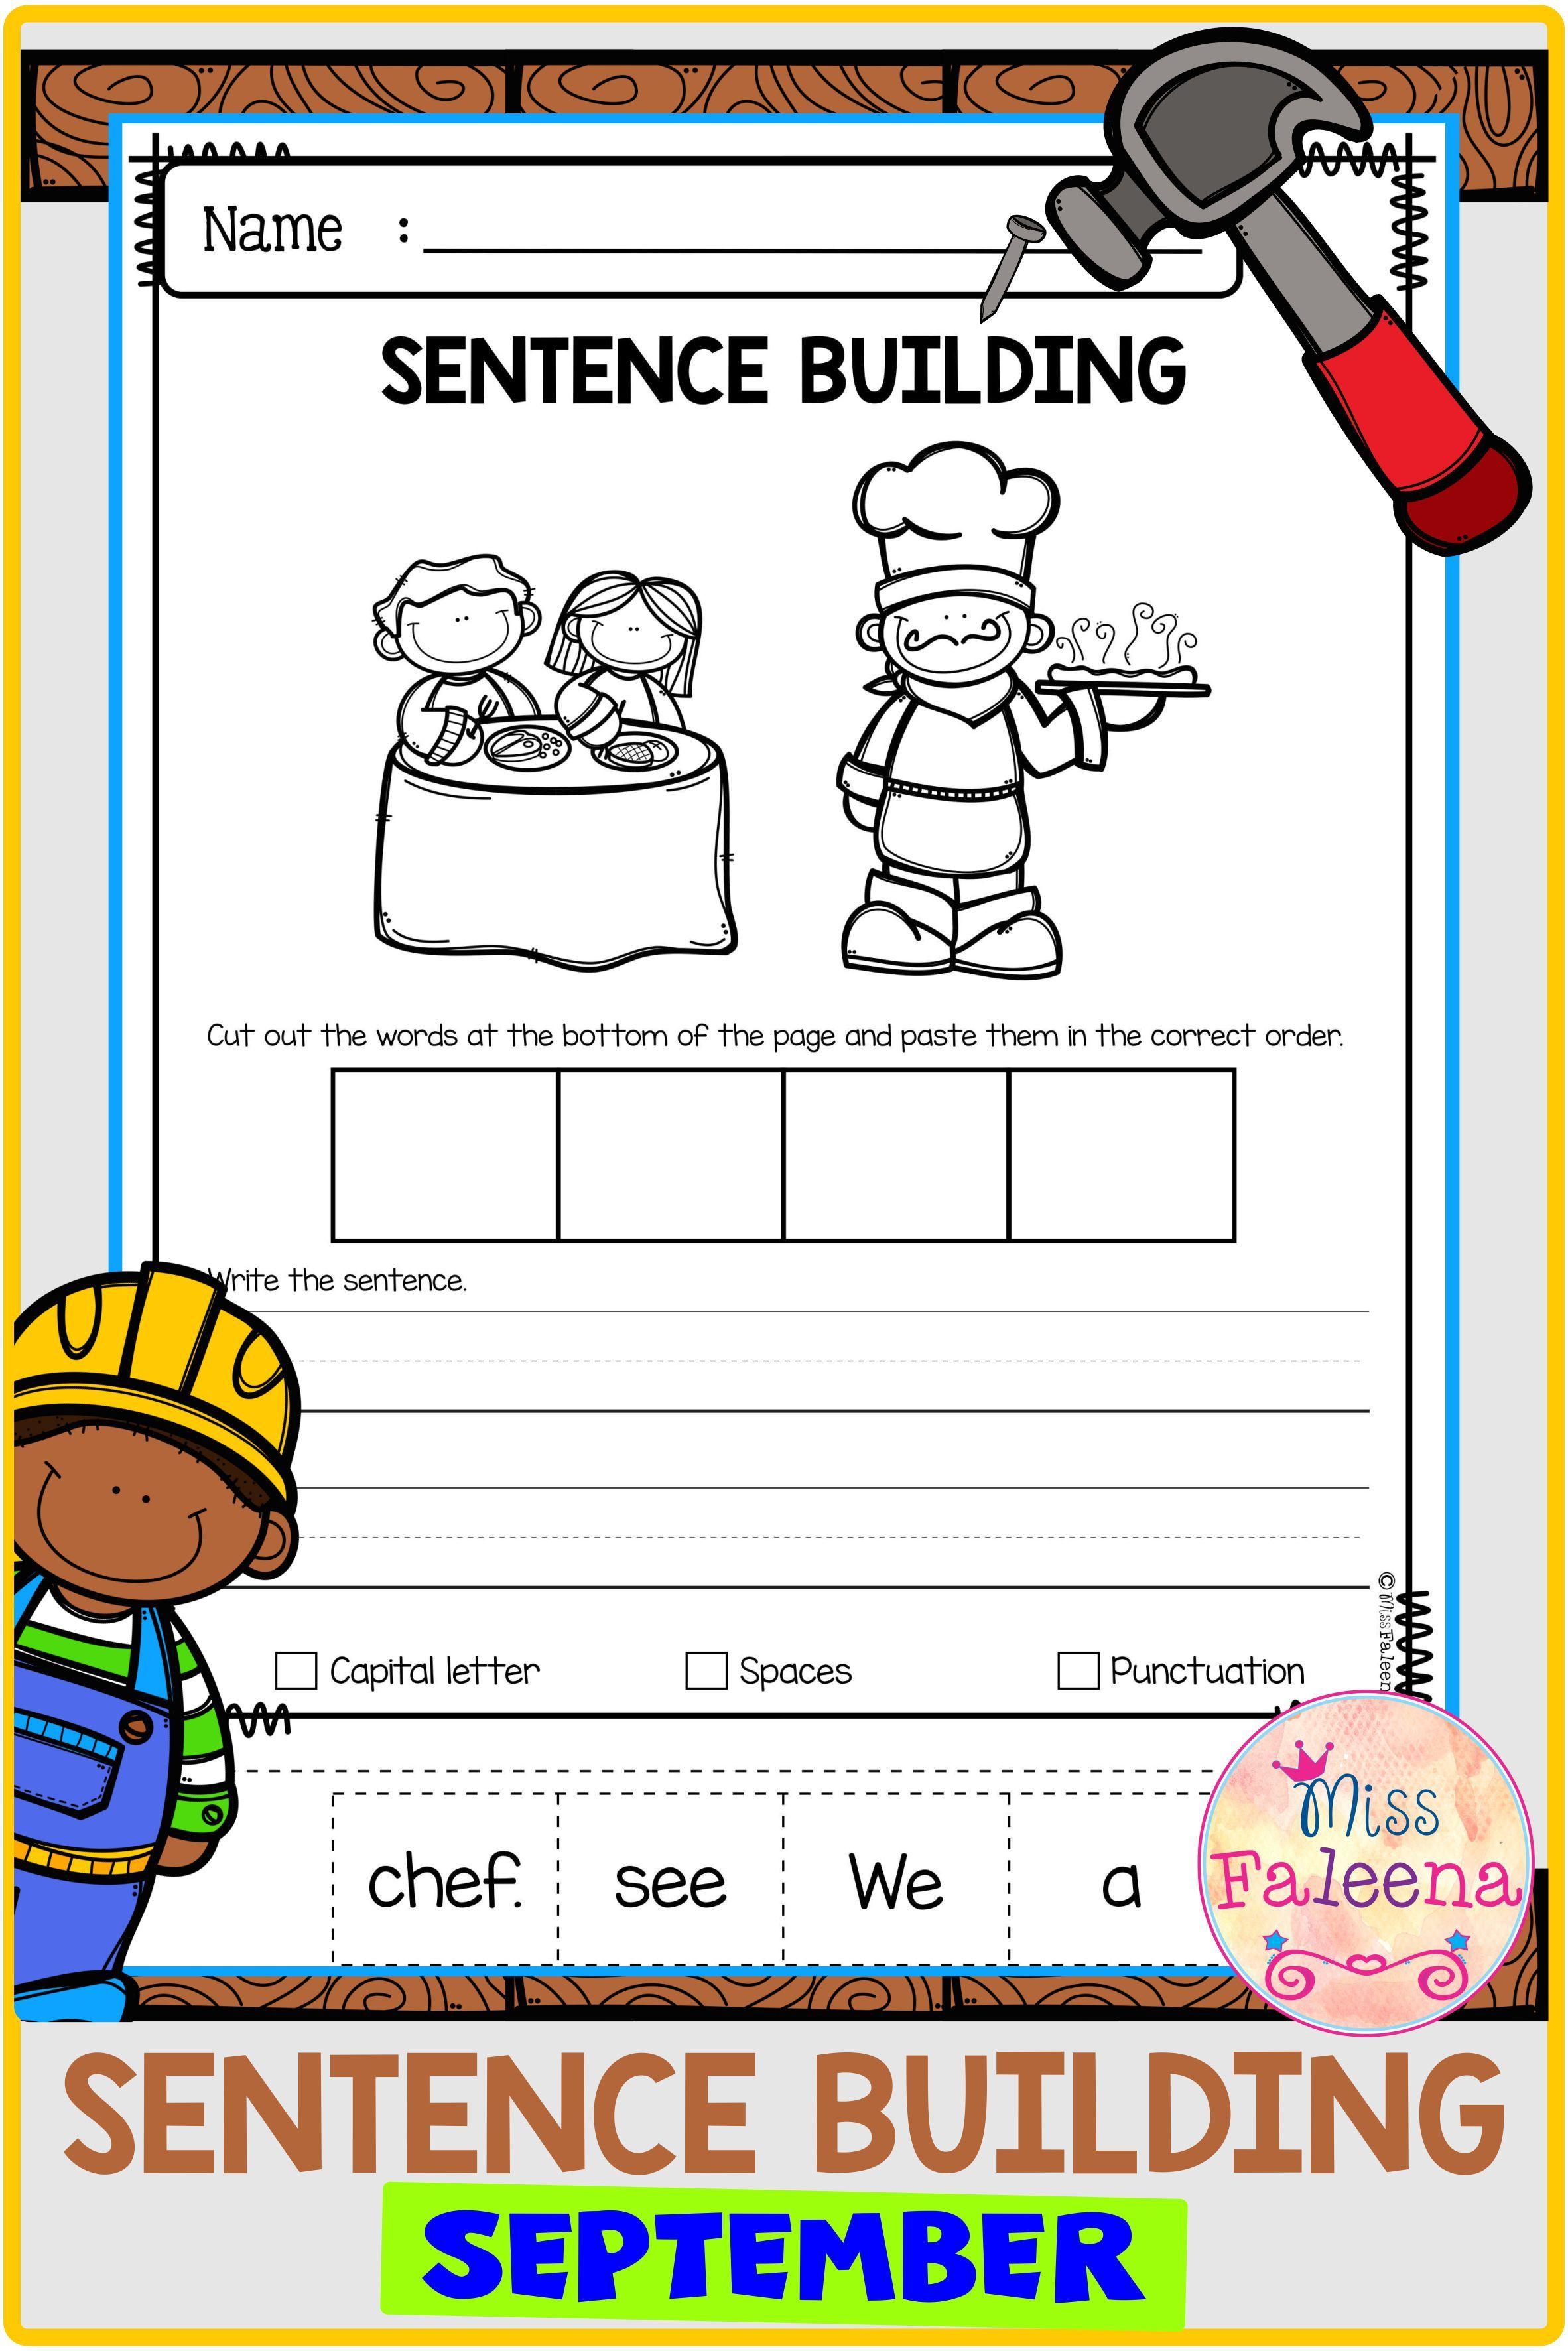 September Sentence Building First Grade Worksheets Sentence Building Worksheets Sentences [ 3544 x 2364 Pixel ]